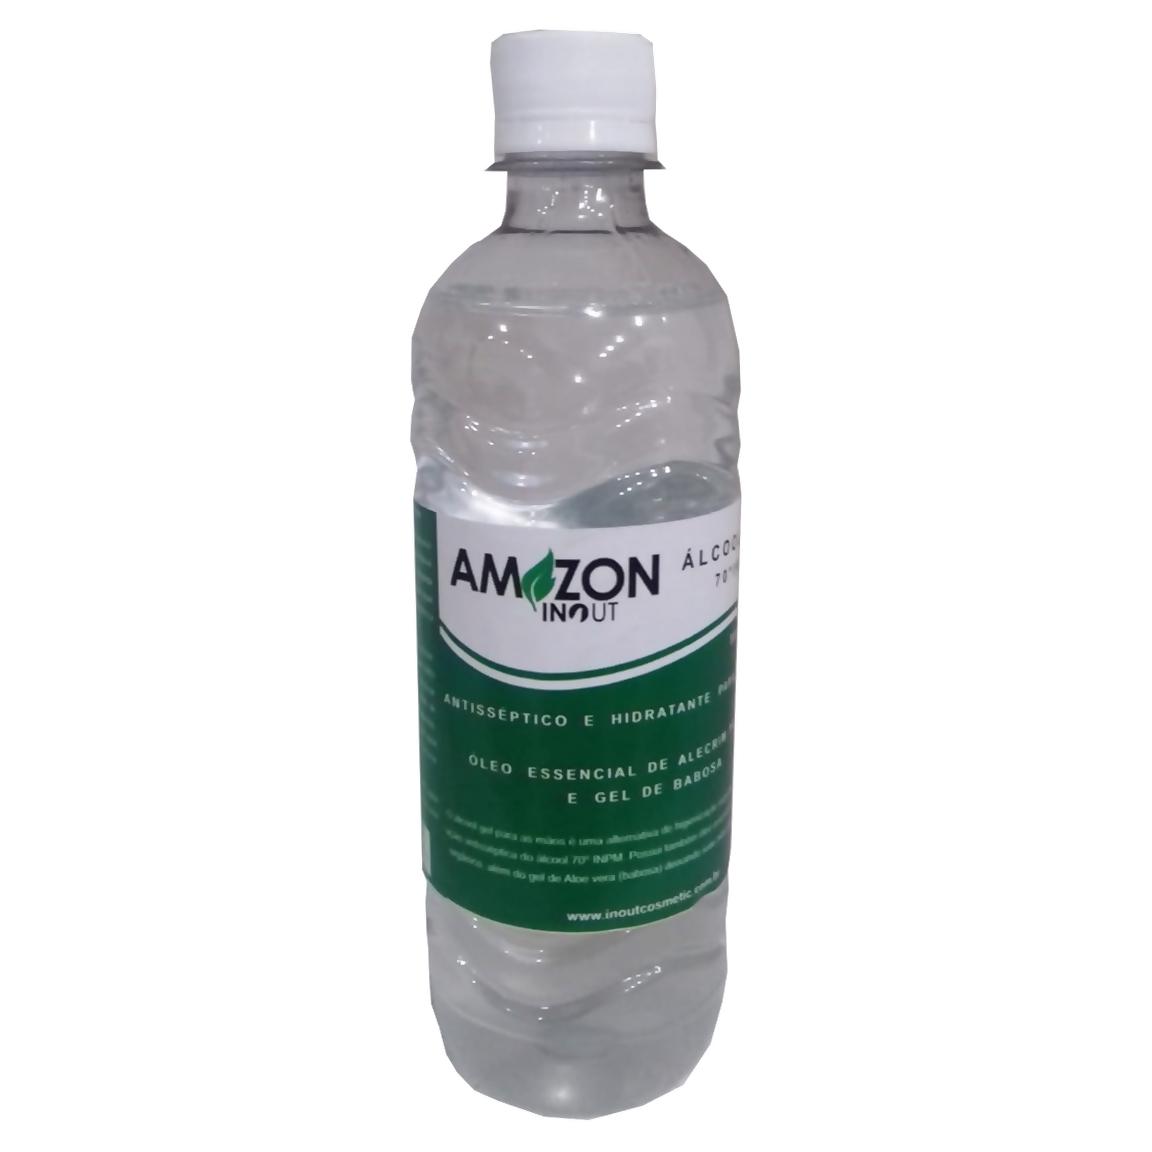 Álcool Em Gel 70º Antisséptico Amazon In Out 500ml